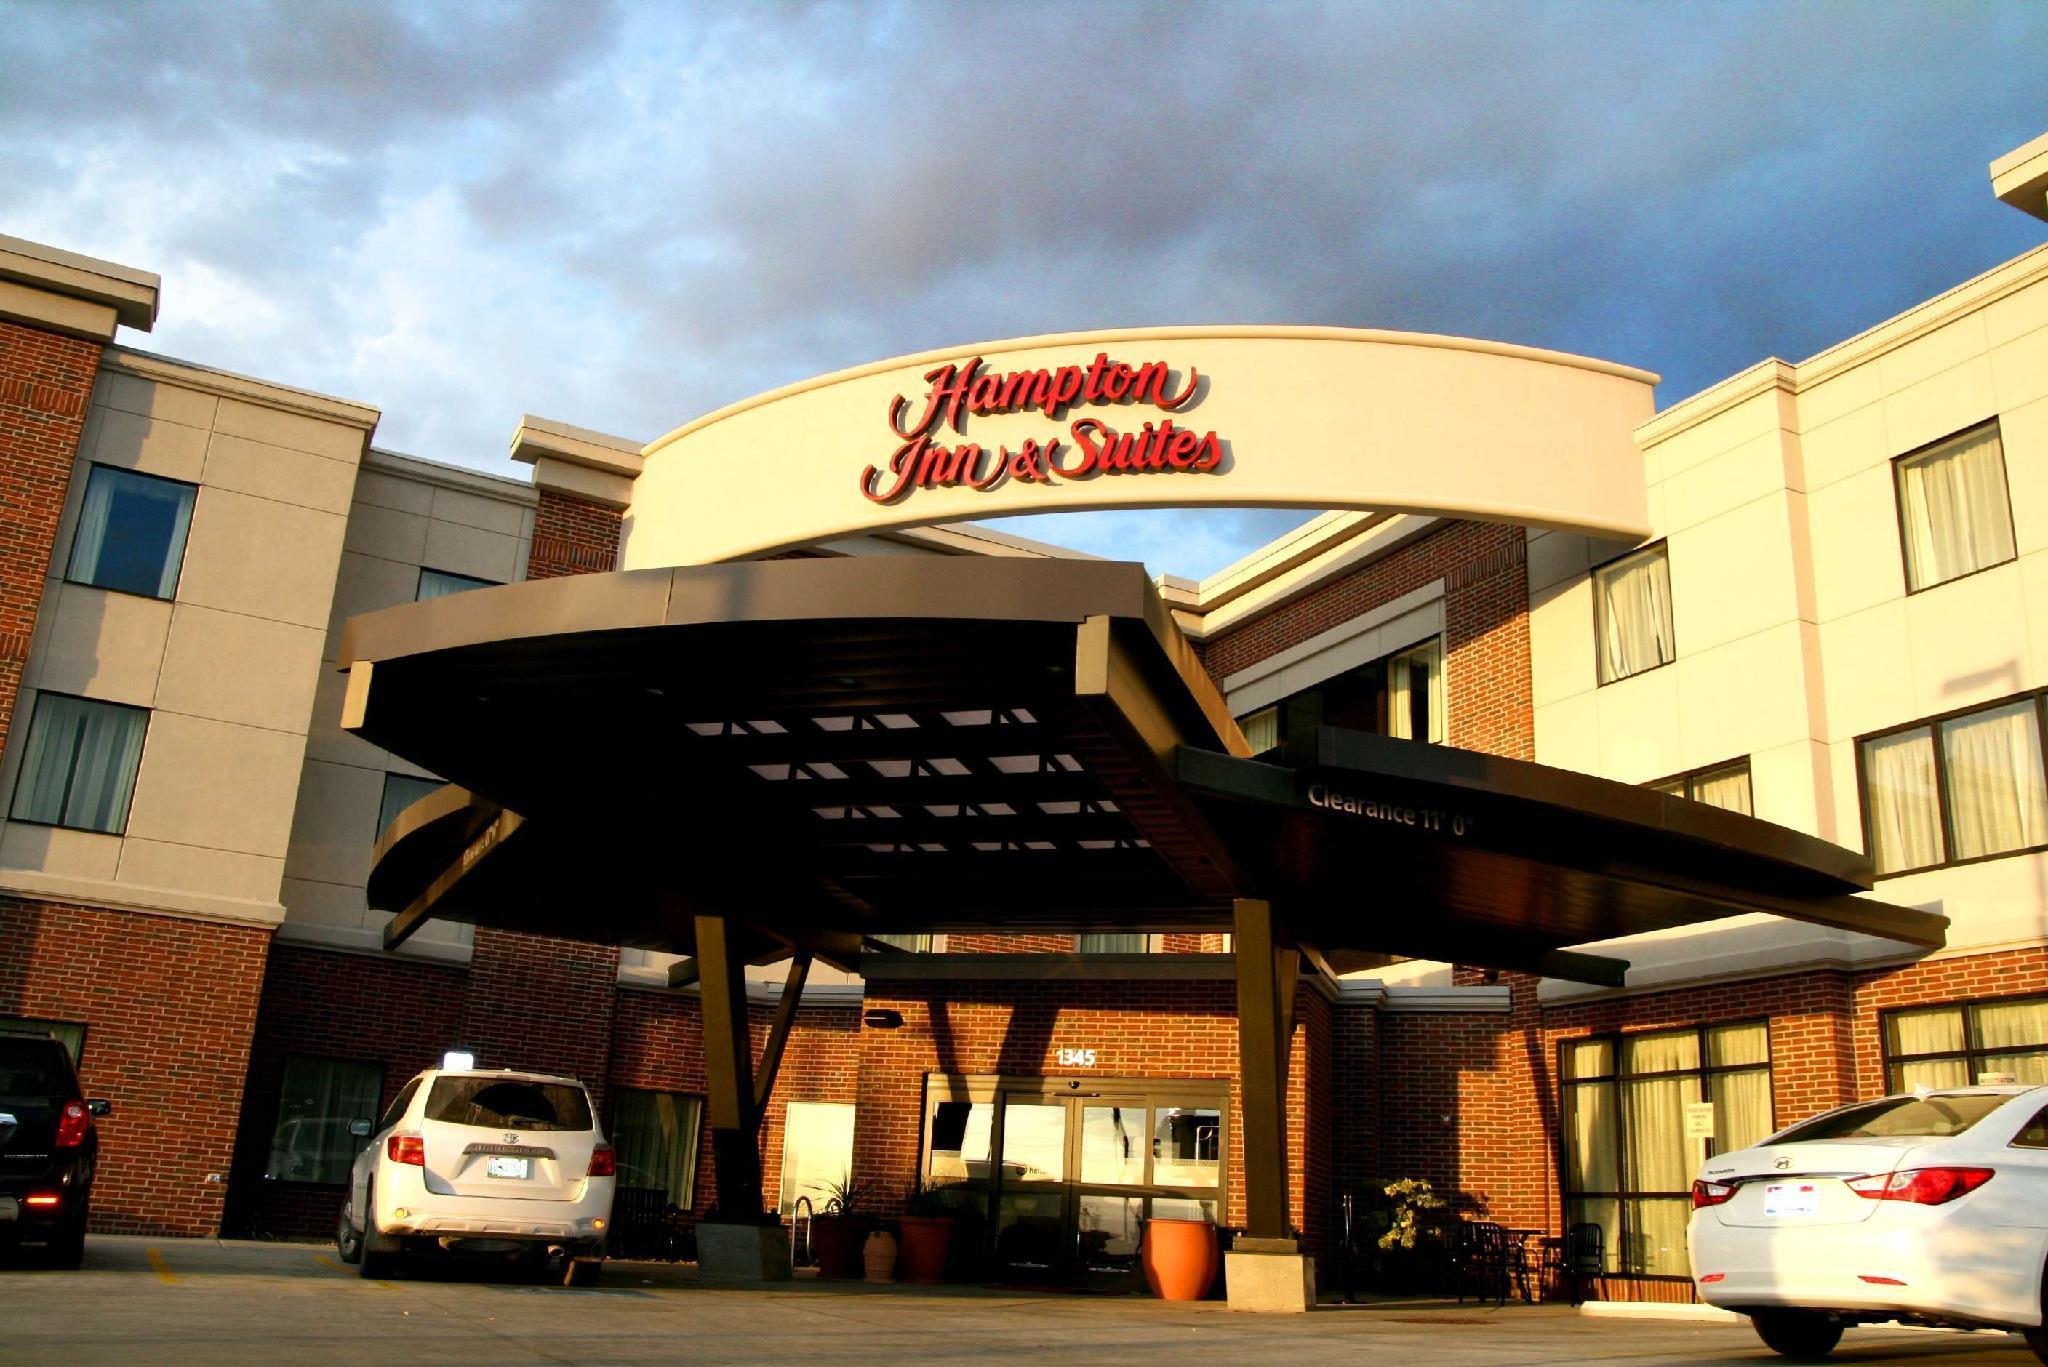 Hampton Inn & Suites Salt Lake City-University/Foothill Drive, Salt Lake